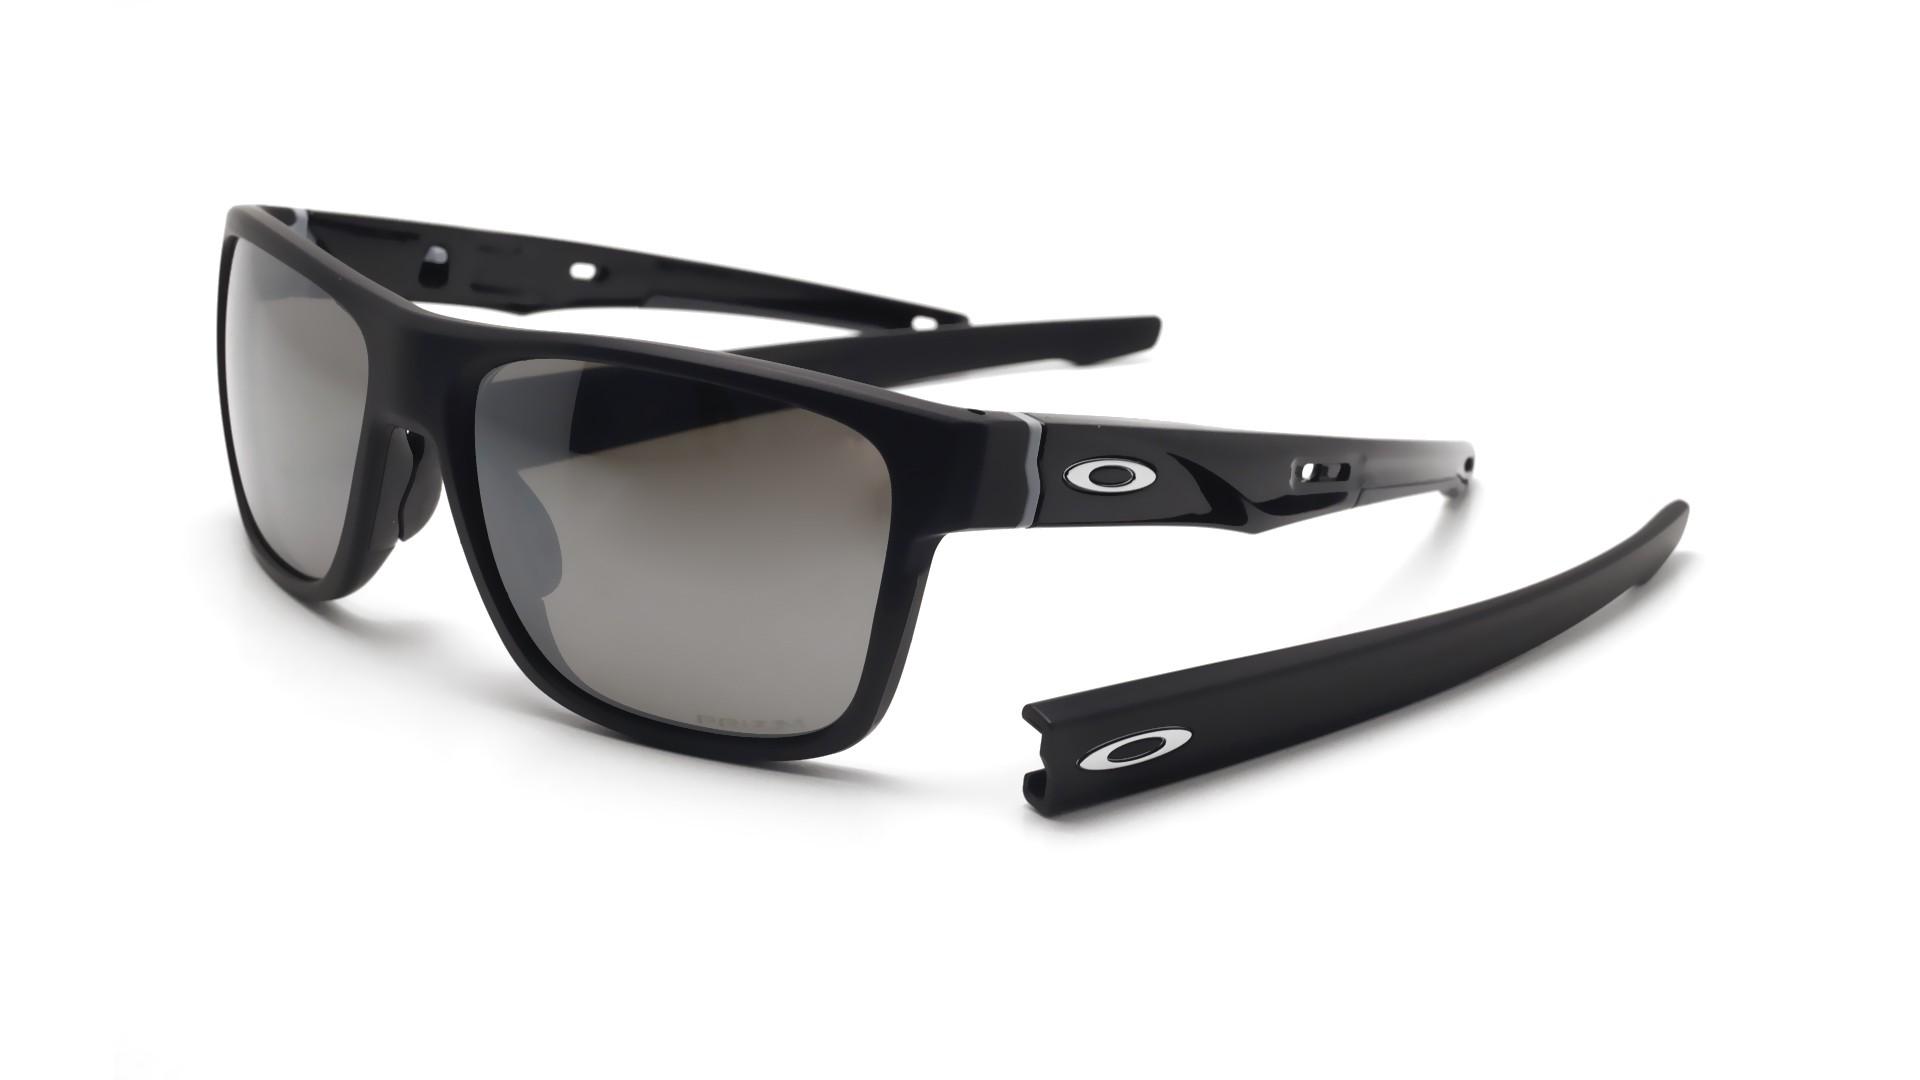 a122c227d97 Sunglasses Oakley Crossrange Black Mat Prizm OO9361 06 57-17 Medium  Polarized Flash